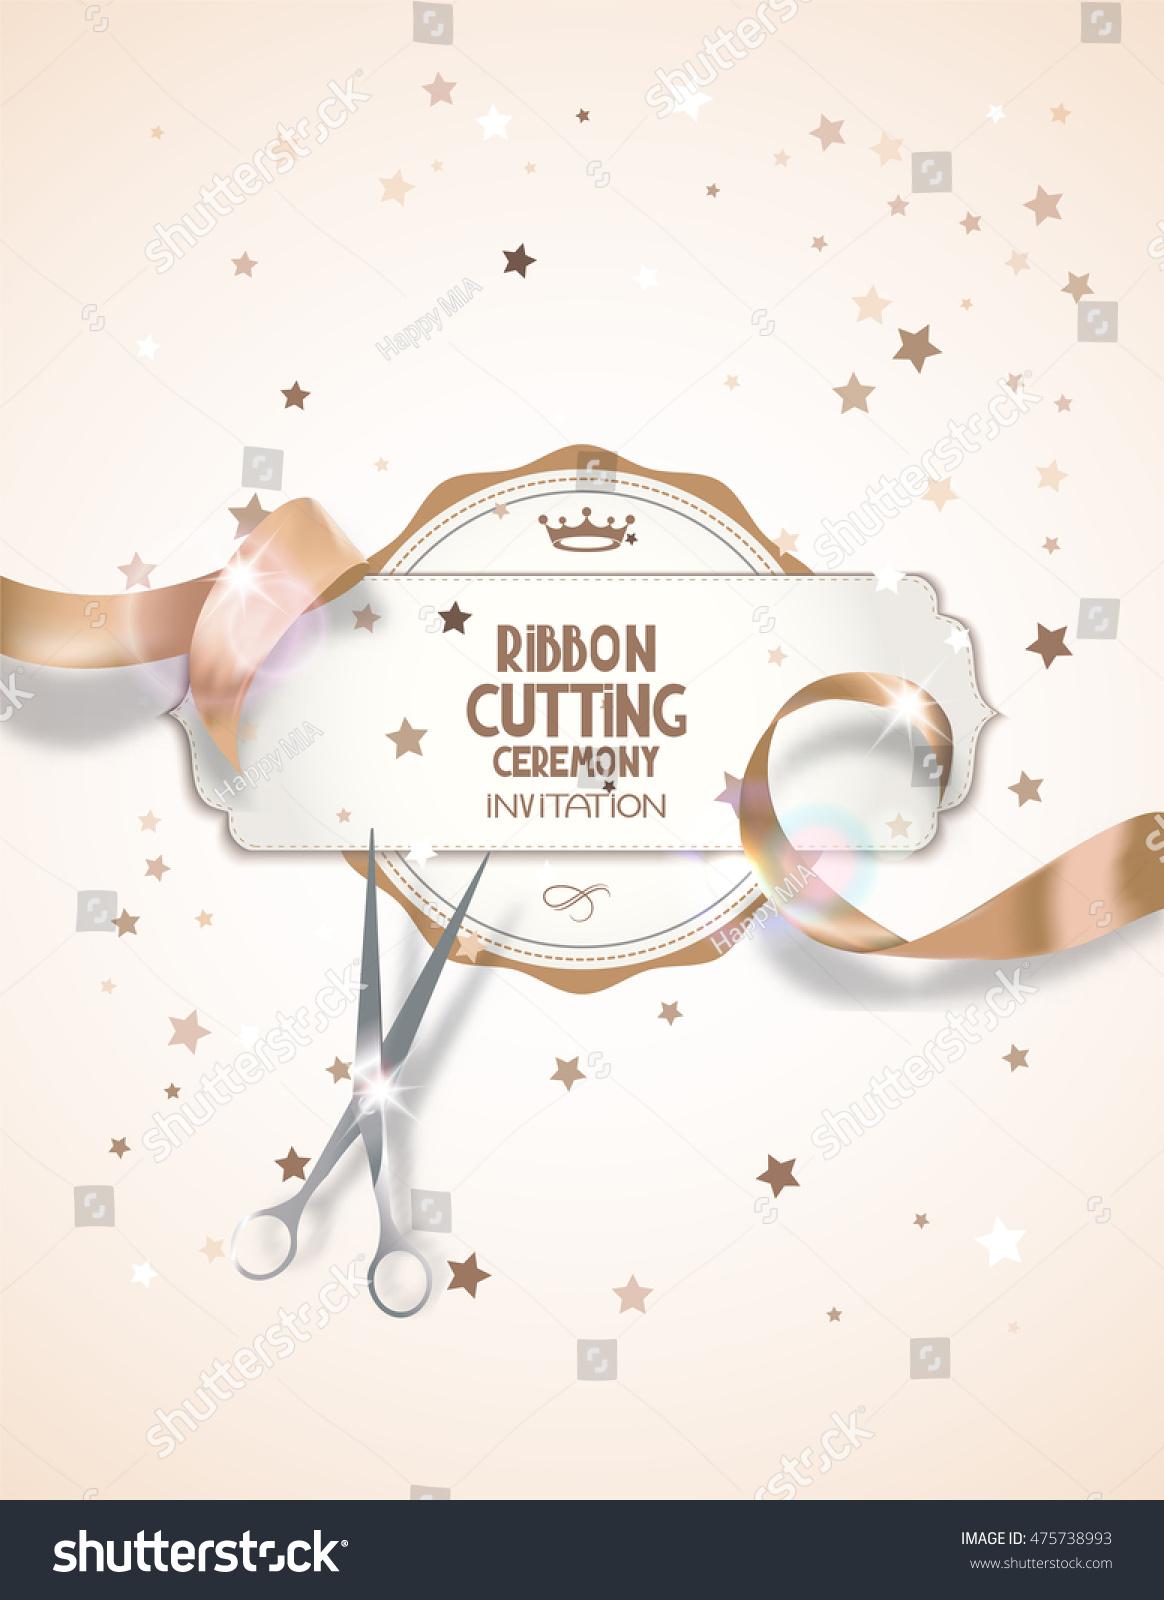 Ribbon Cutting Ceremony Invitation Card Beige Stock Vector